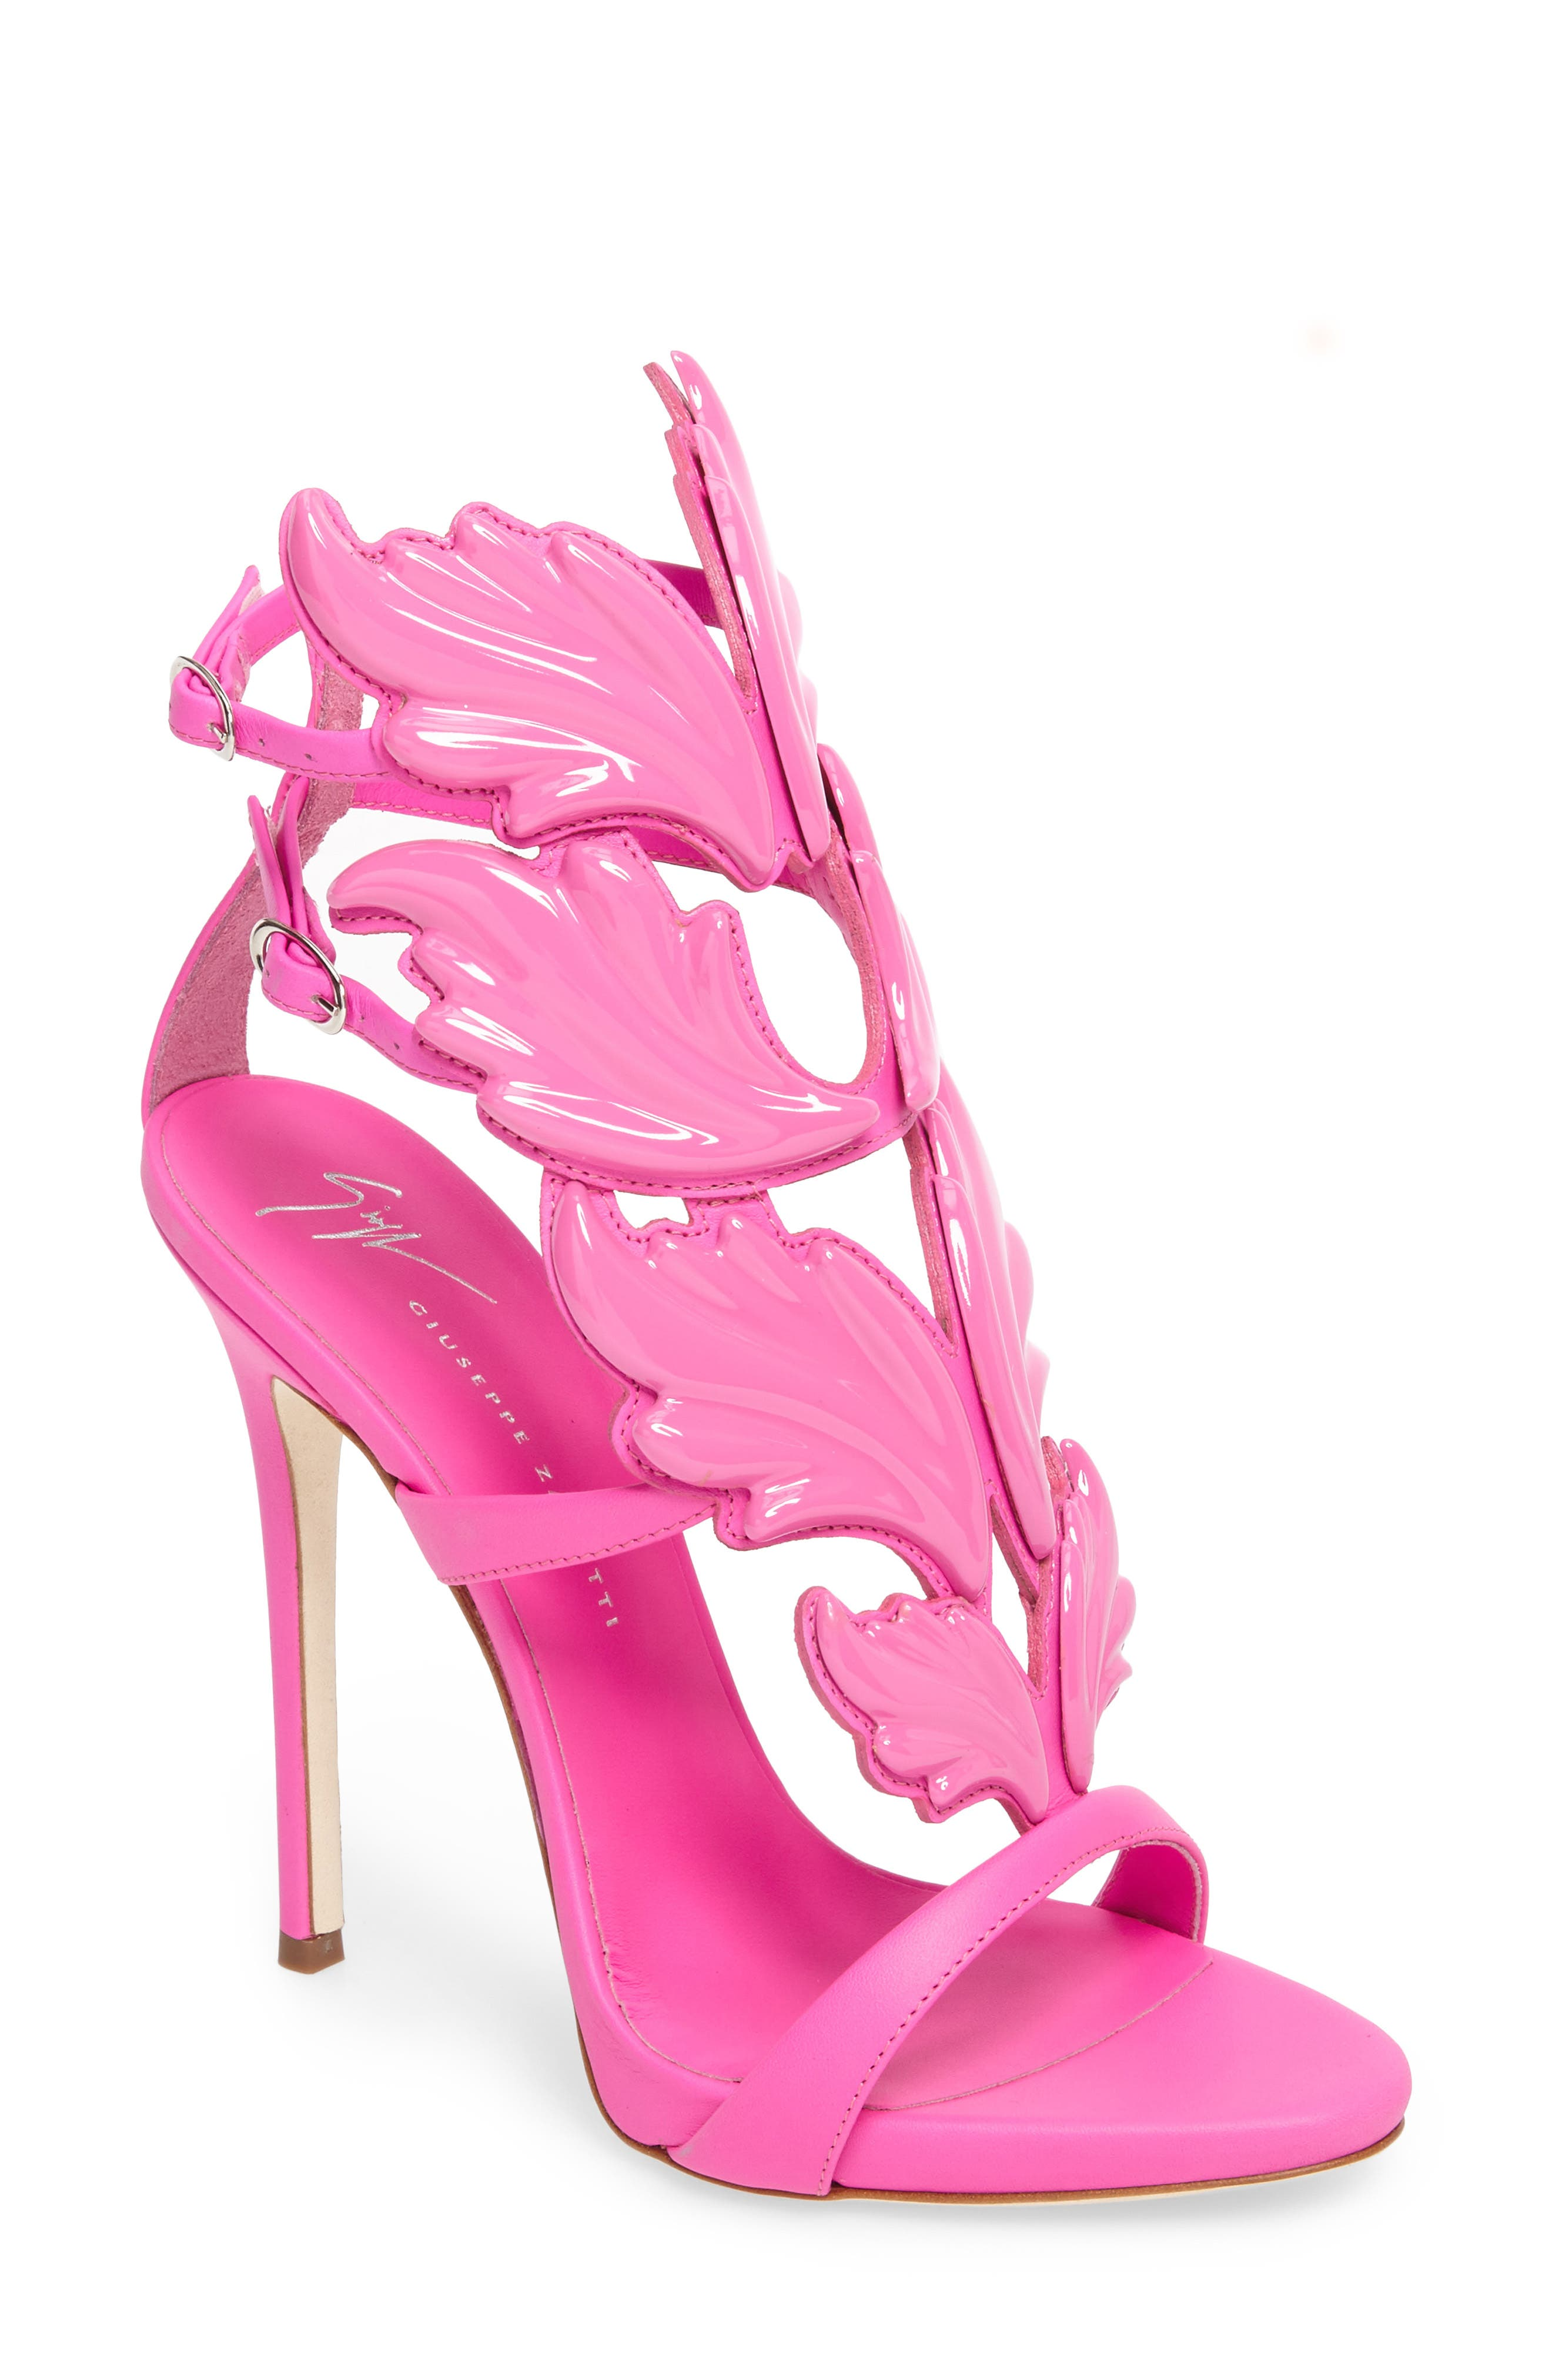 Main Image - Giuseppe Zanotti 'Cruel' Wing Sandal (Women)